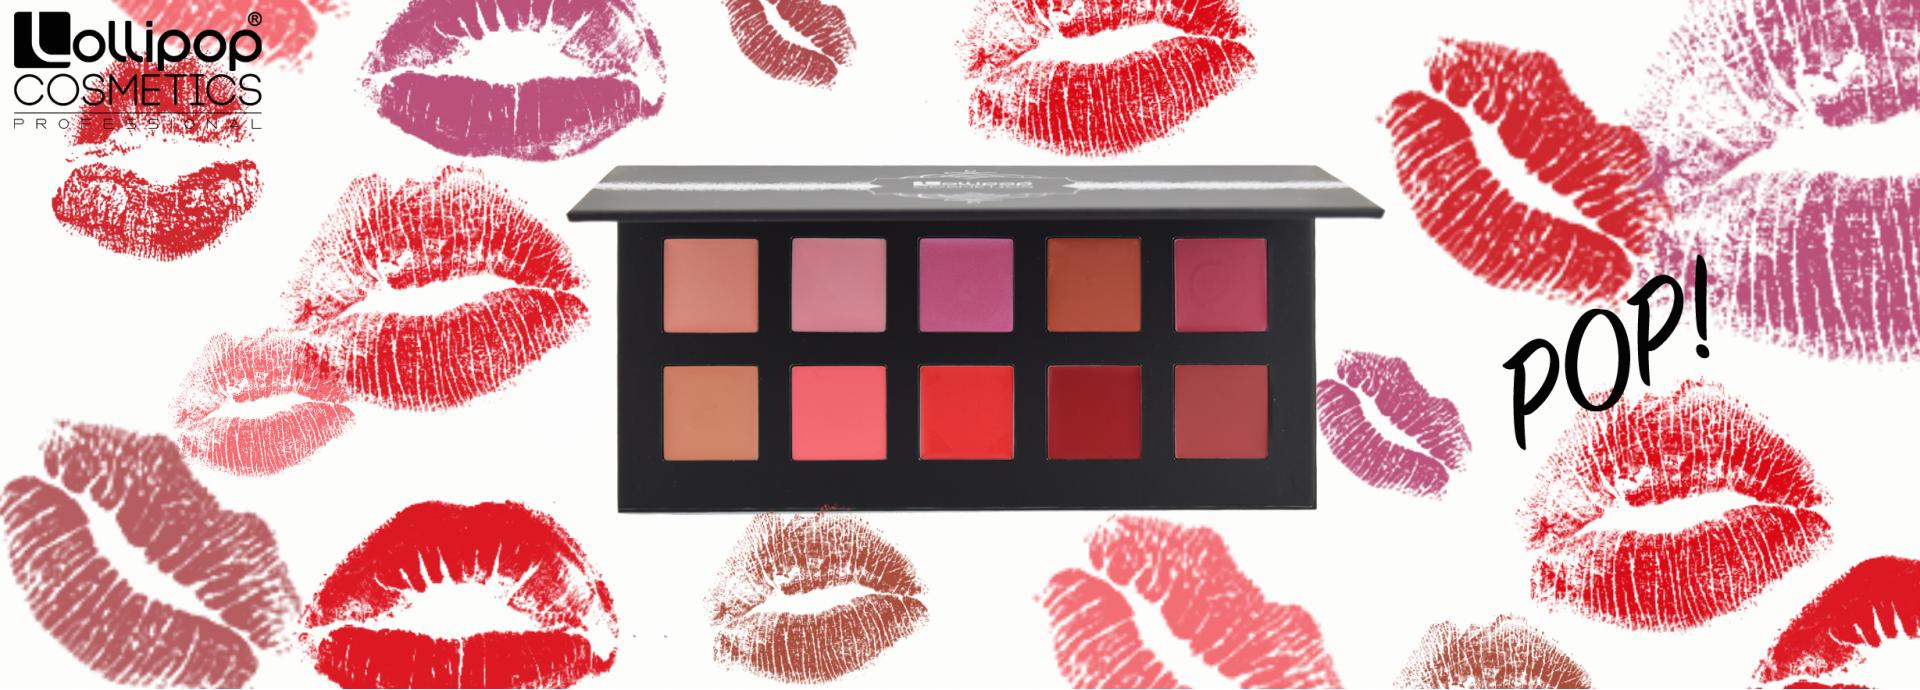 lipsticks pop